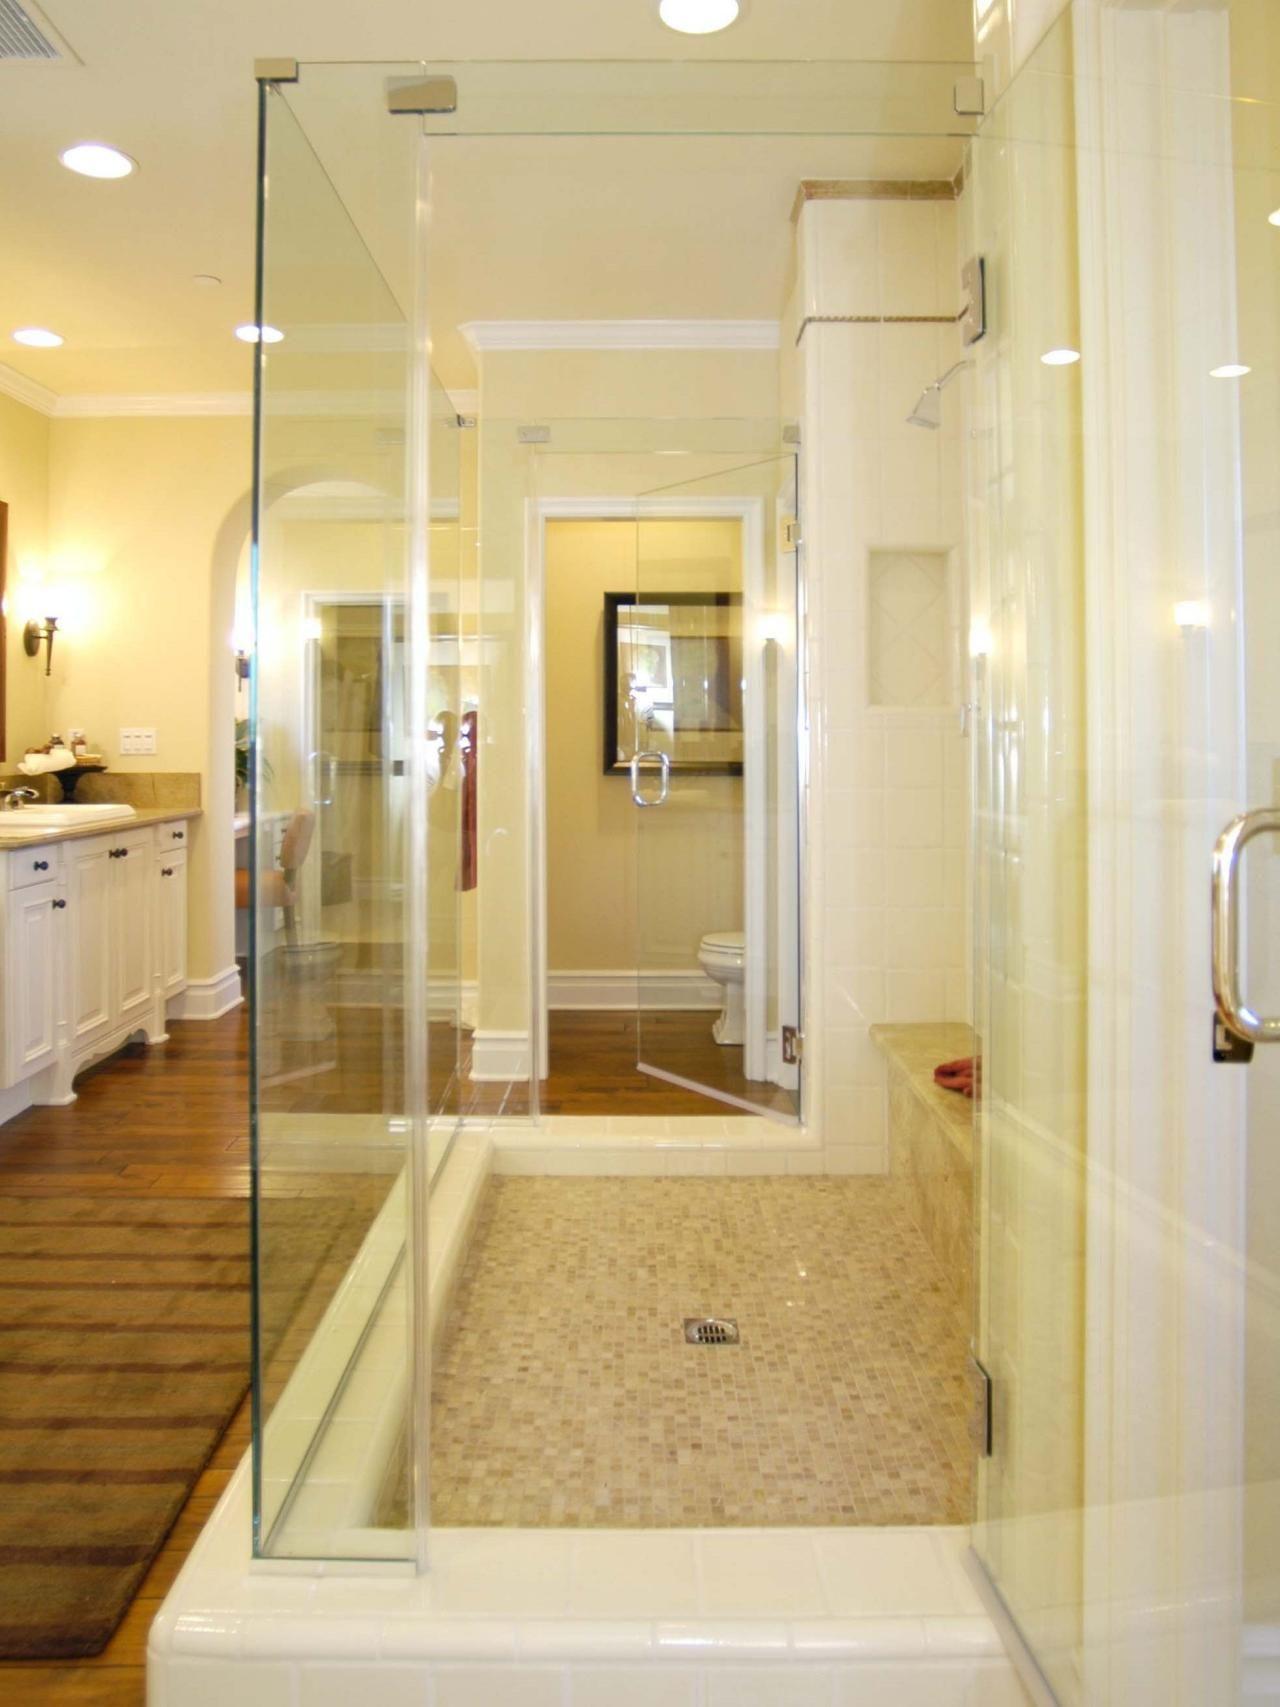 4 x 6 shower design. Open Walk in shower Tile floor stone  WALK IN SHOWER PRO FLOORING Remodel Spa Bathroom Pinterest Shower tiles and